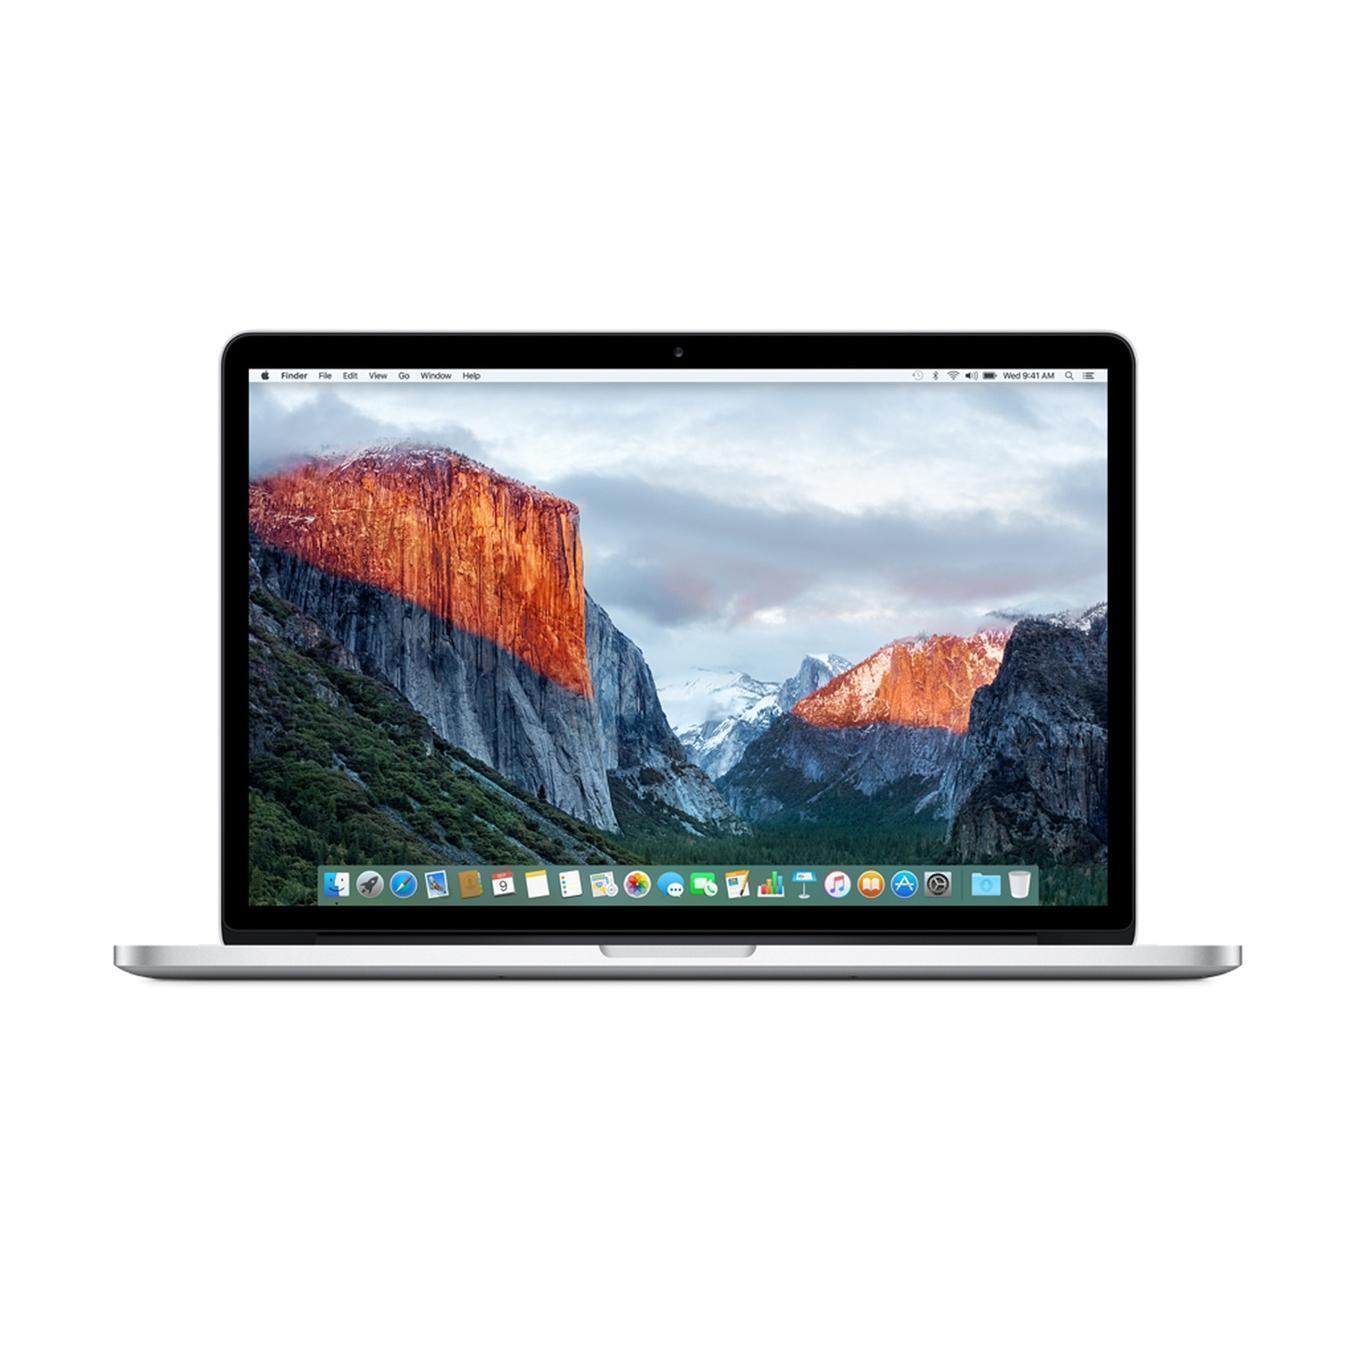 MacBook Pro Retina 15,4-tum (2013) - Core i7 - 8GB - SSD 256 GB QWERTY - Nederländska